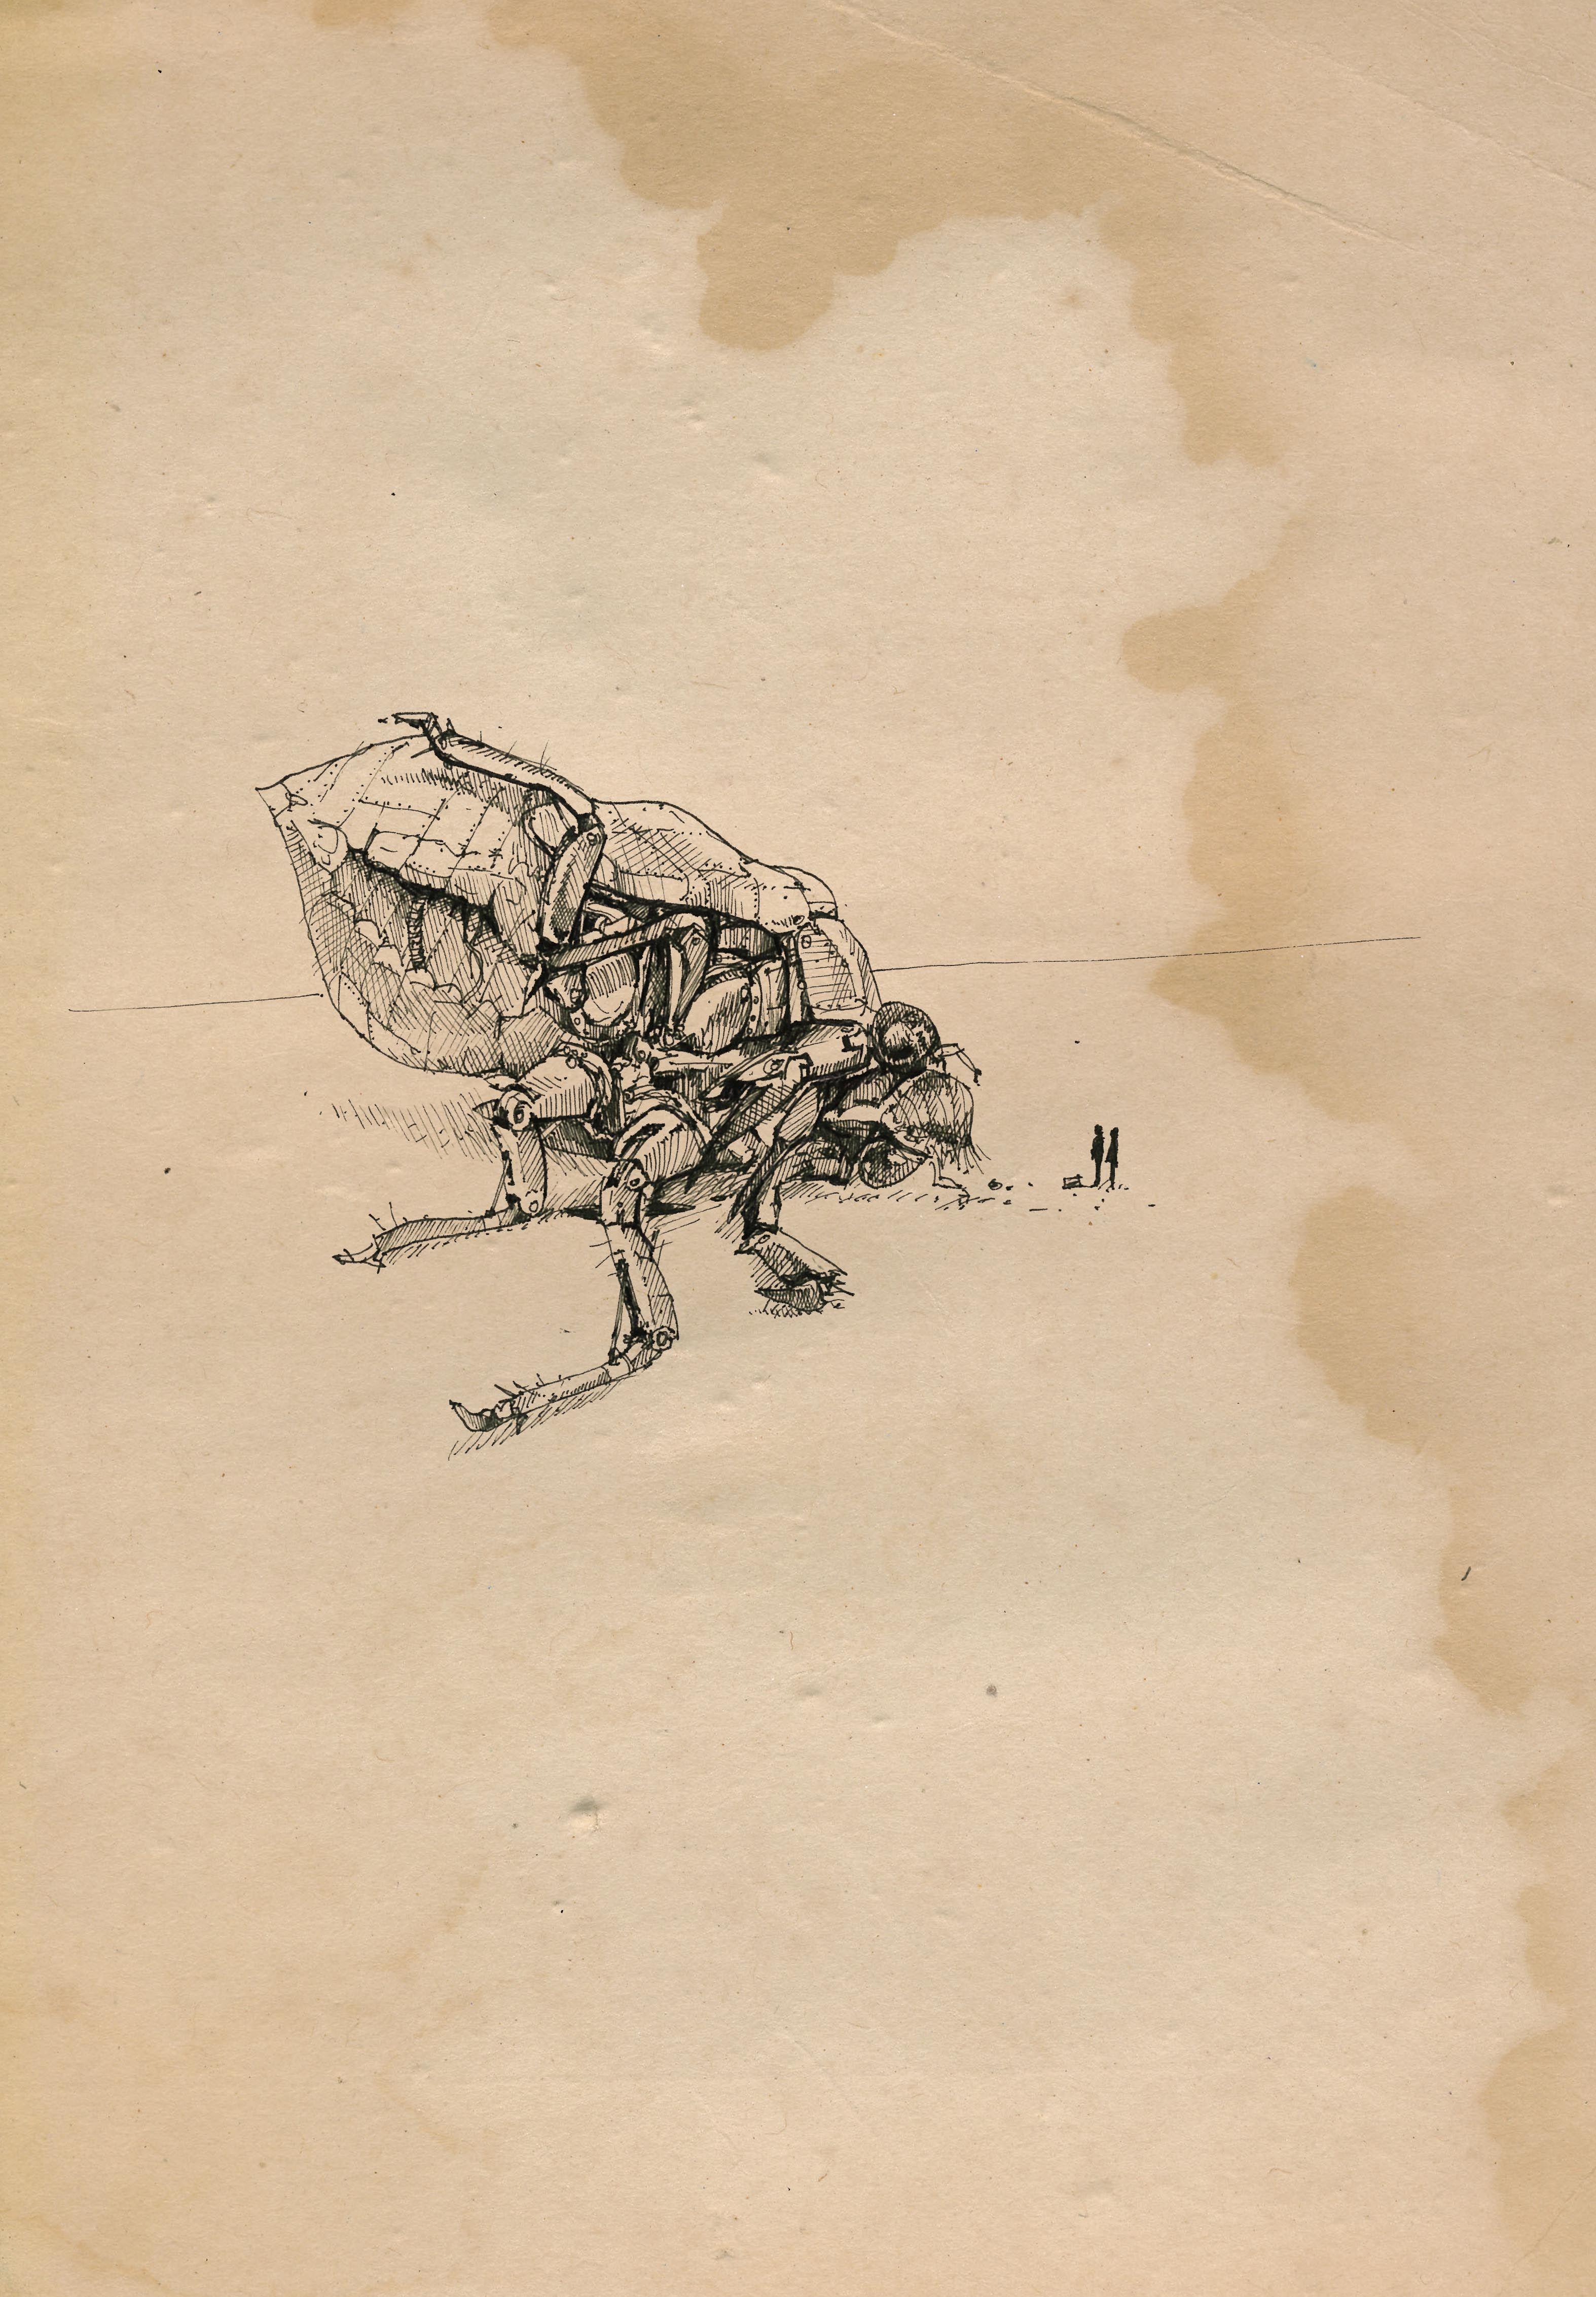 Robot dead fly robot fly sketch ink illustration on old paper ink illustration on old paper malvernweather Images